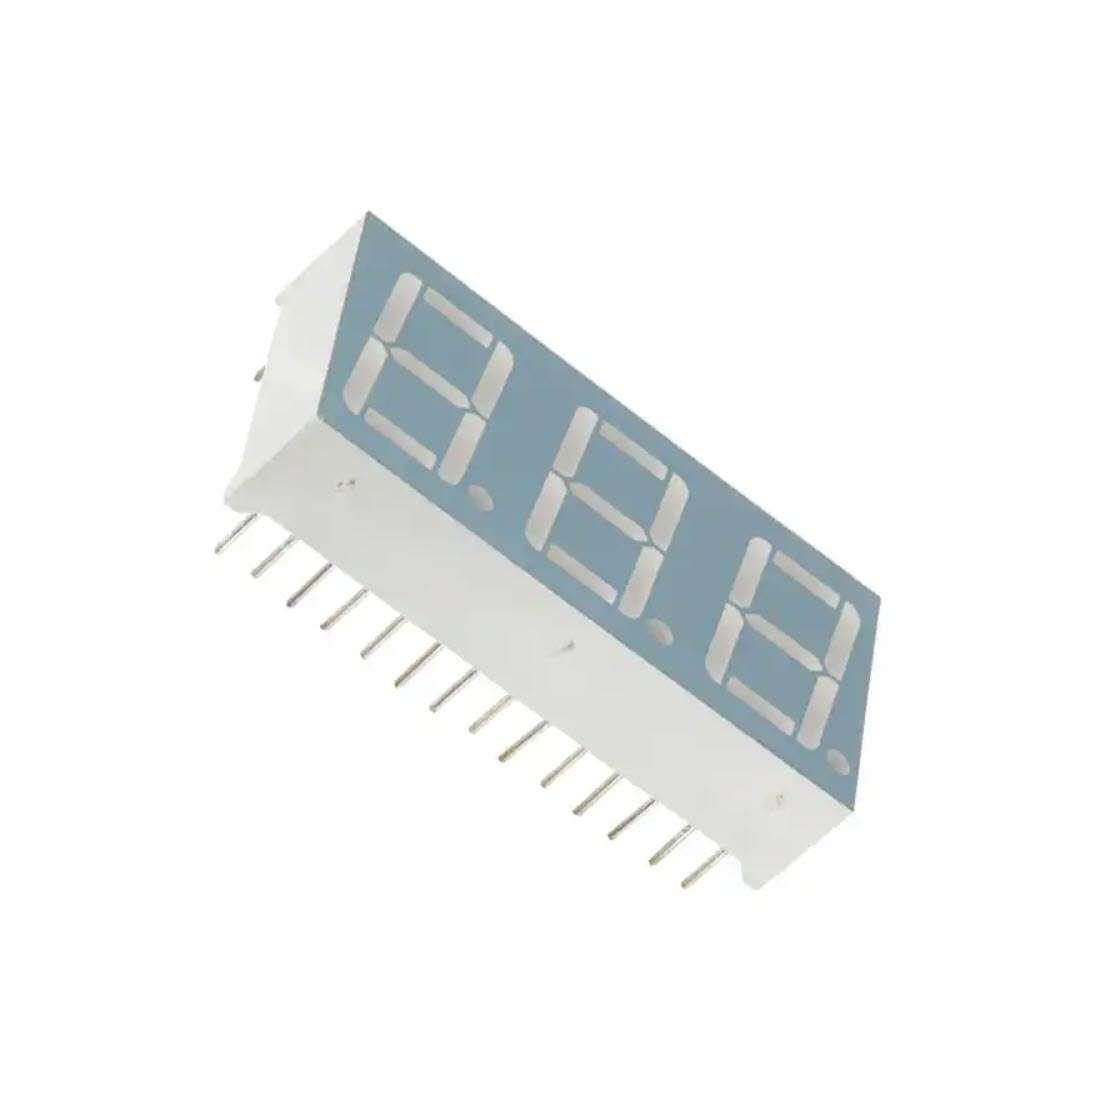 Roland MC-505 Current/Next Display